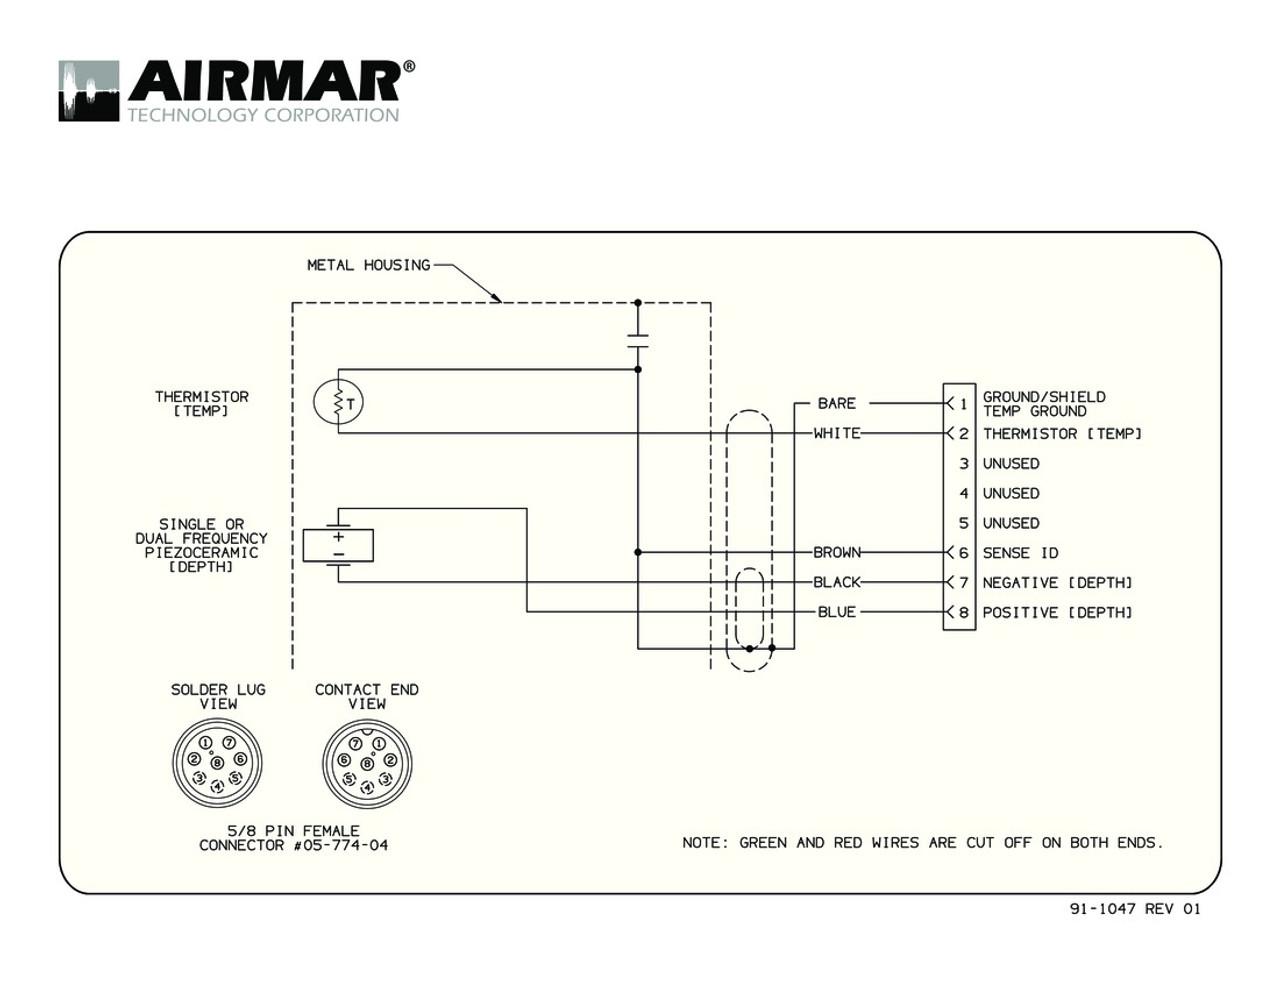 hight resolution of garmin radar wiring diagram wiring librarydepth u0026 temperature b117 transducers with garmin 8 pin connector